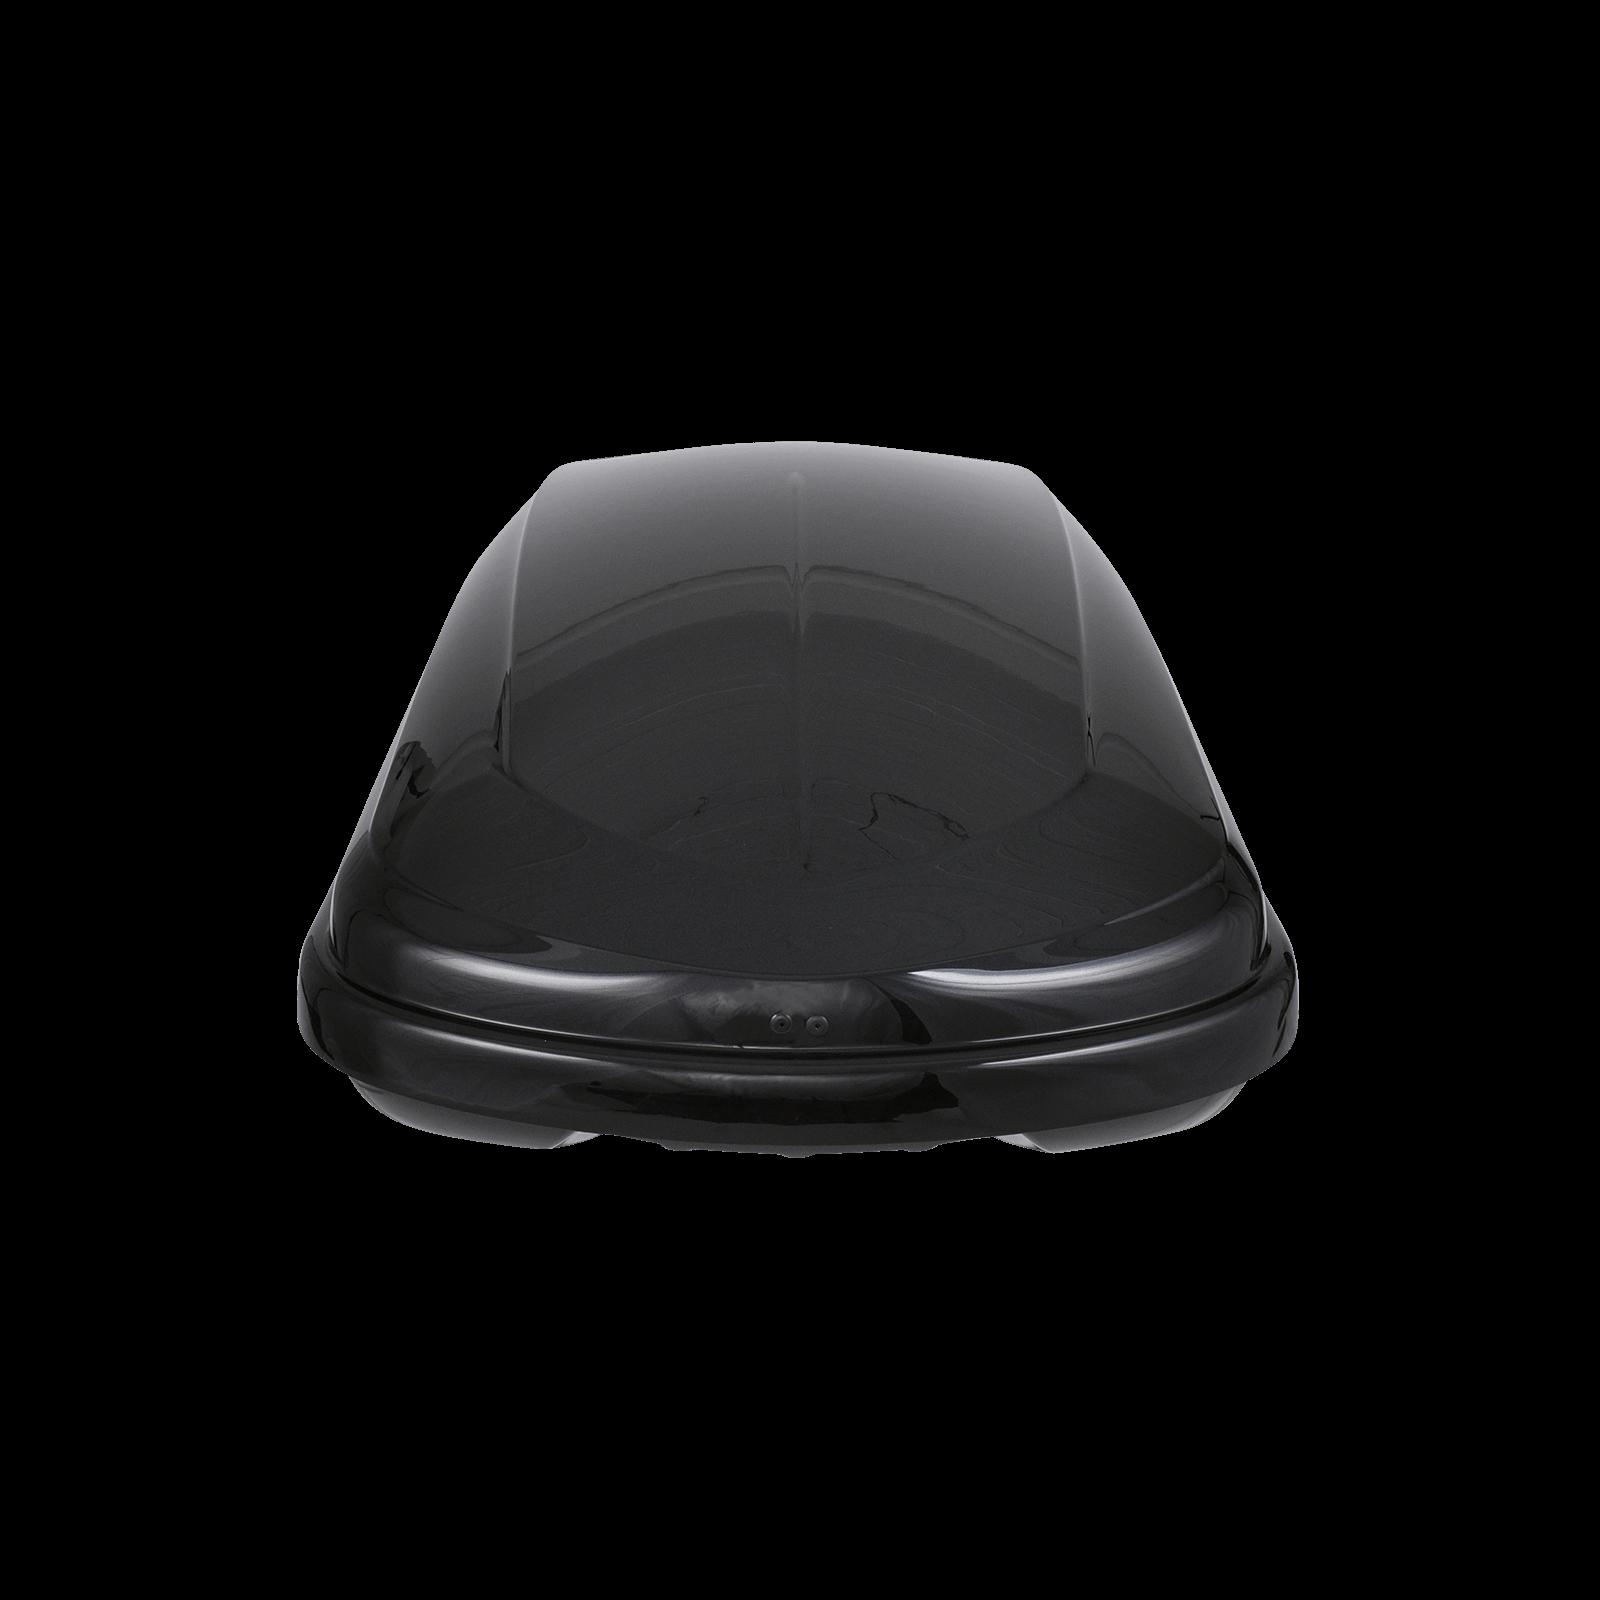 Dachbox Hapro Traxer 6.6 Brilliantblack - Bild 4